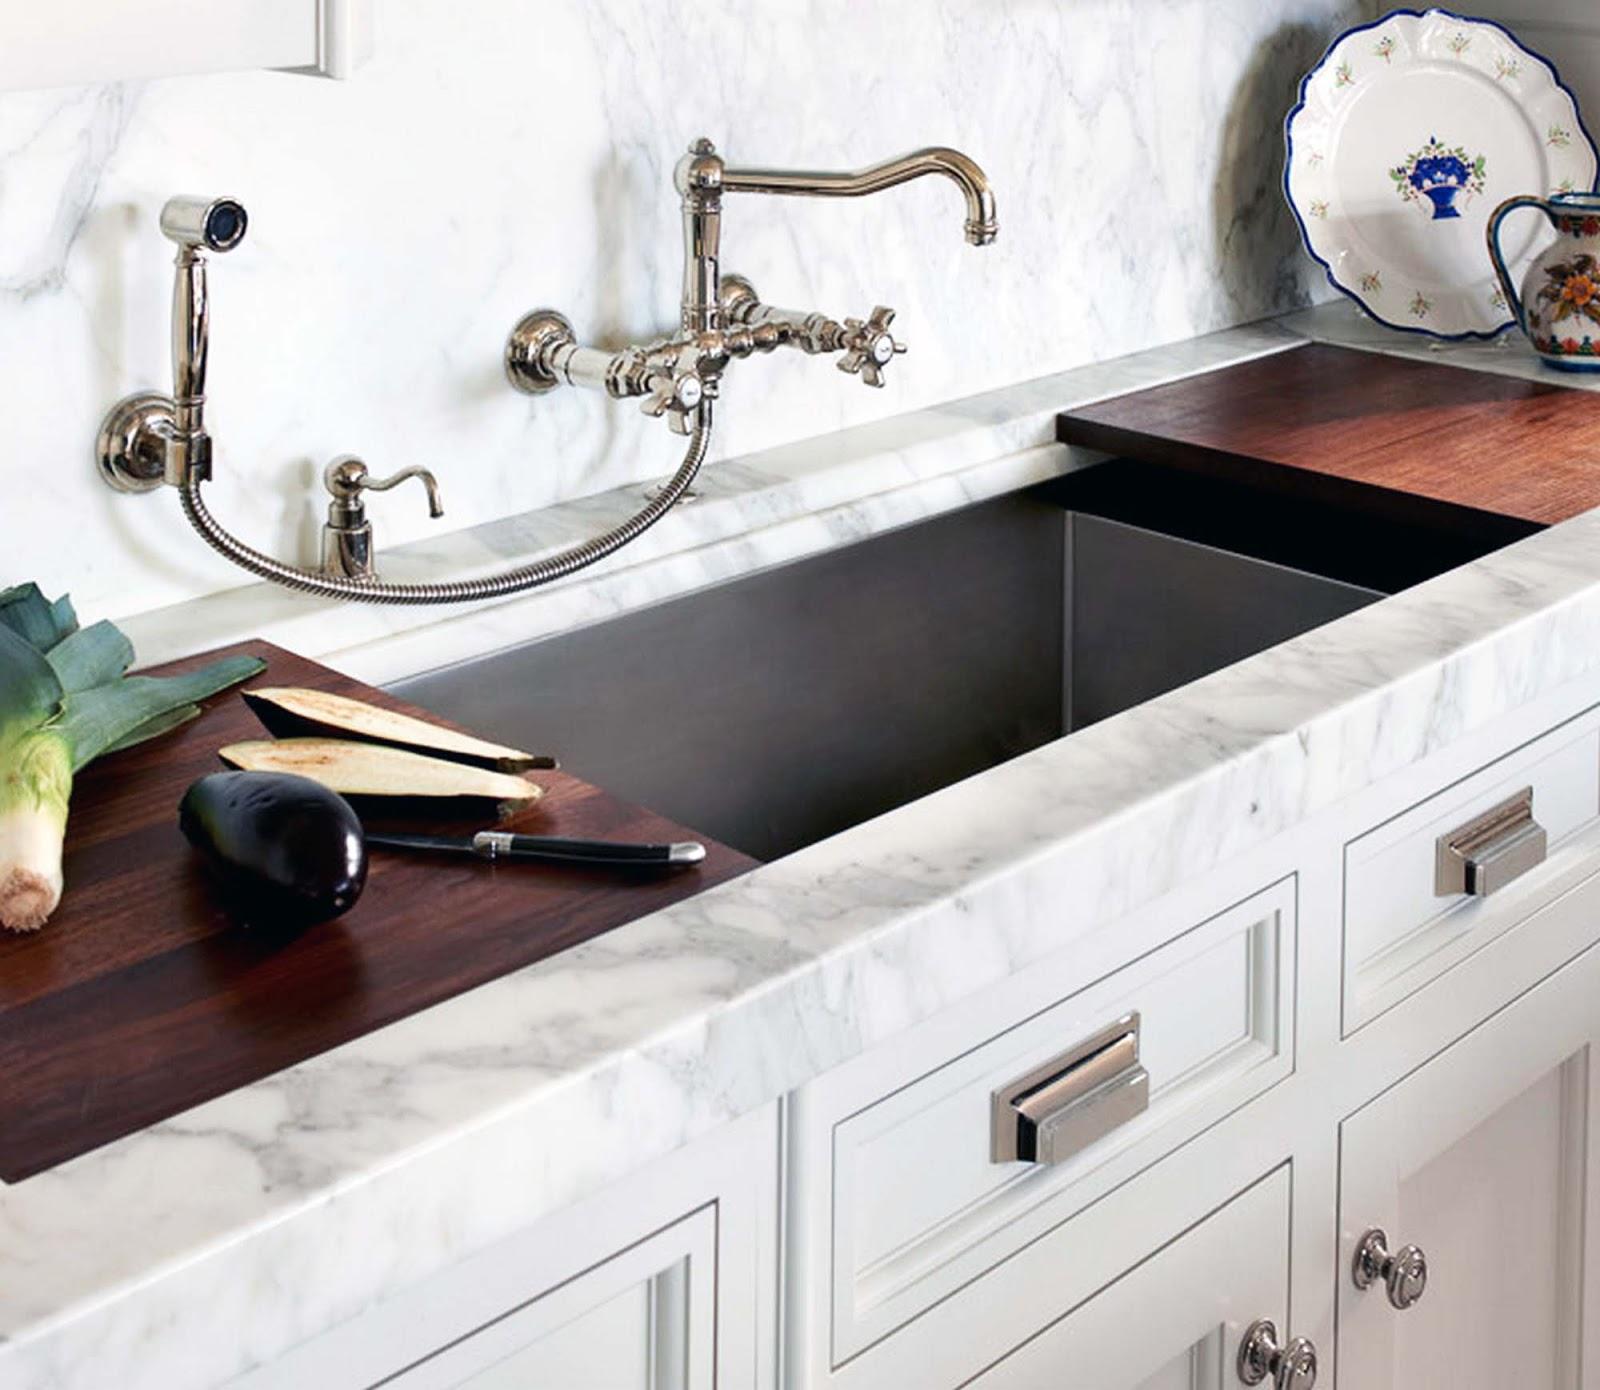 罎笘竊罎笆篏 kitchen faucet petency wall mount kitchen faucet kitchen